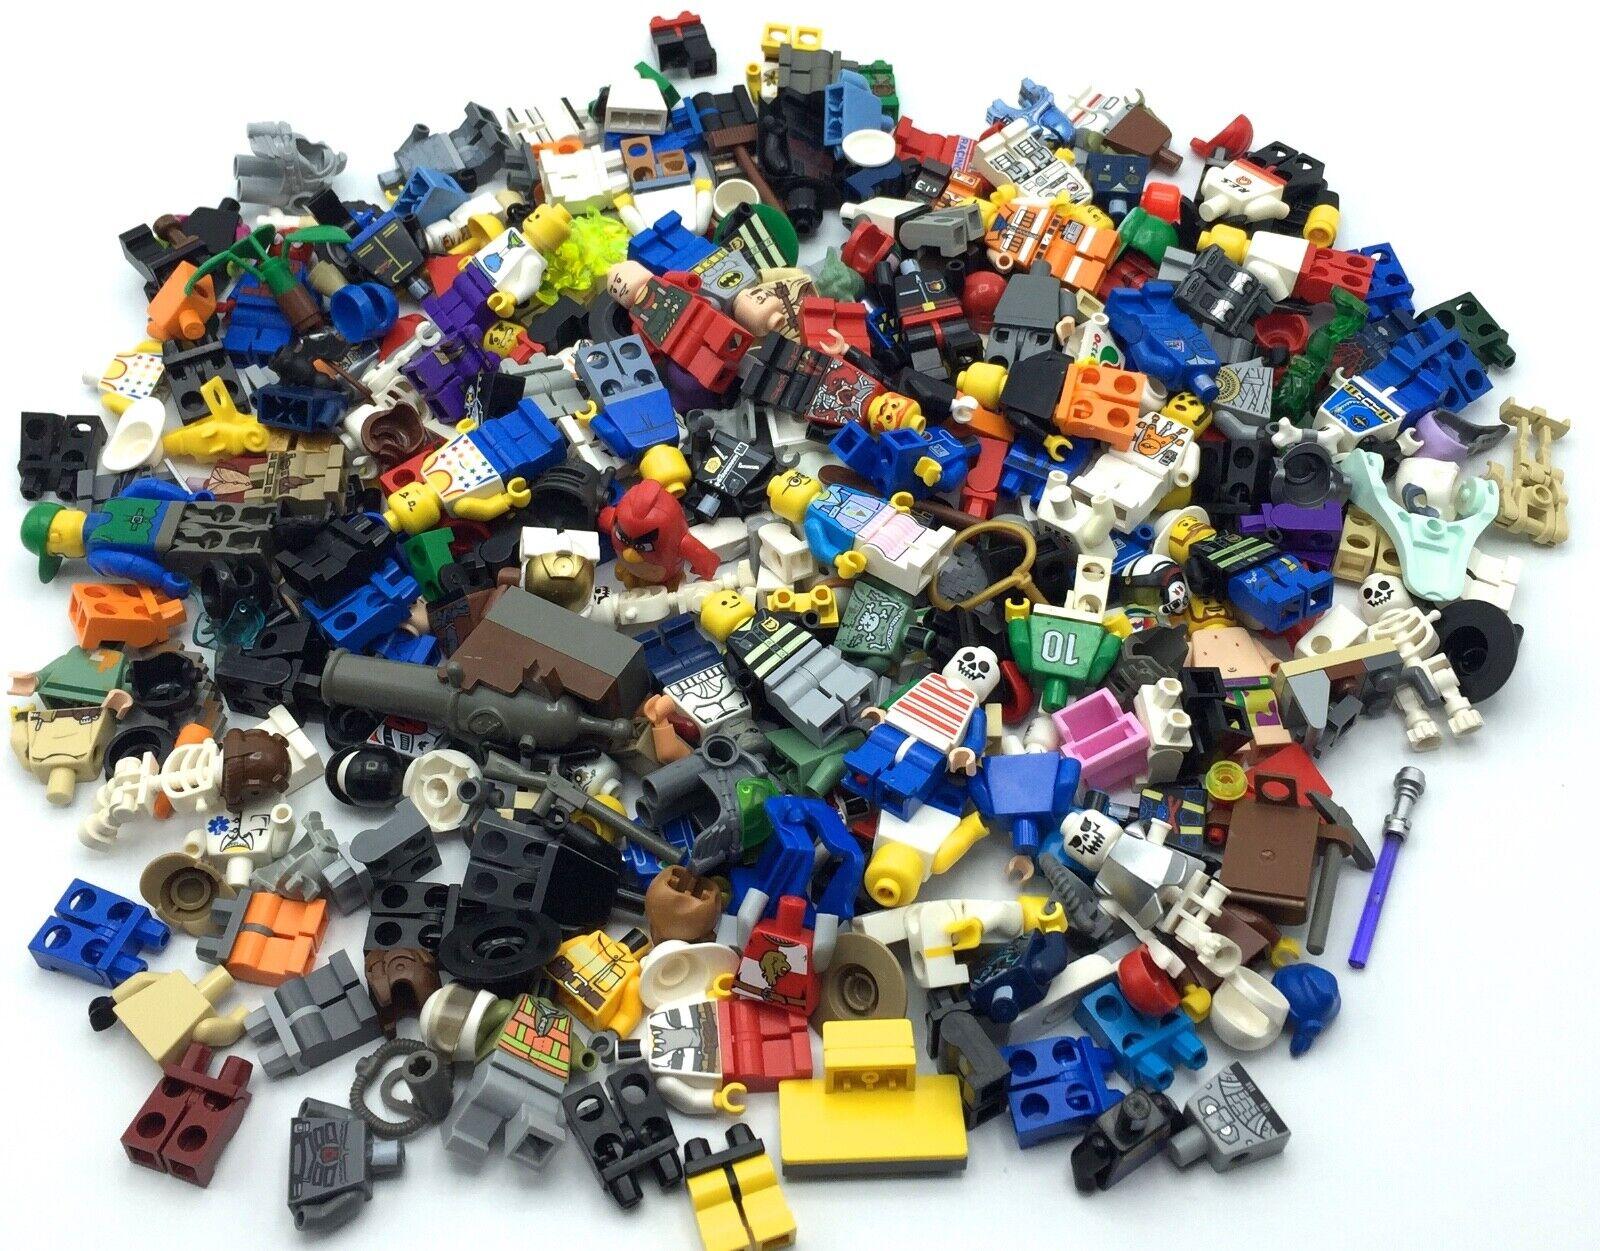 LEGO HUGE LOT NEAR 1 POUND MINIFIGURE PARTS BODY PIECES PEOPLE MIX 15+ OUNCES